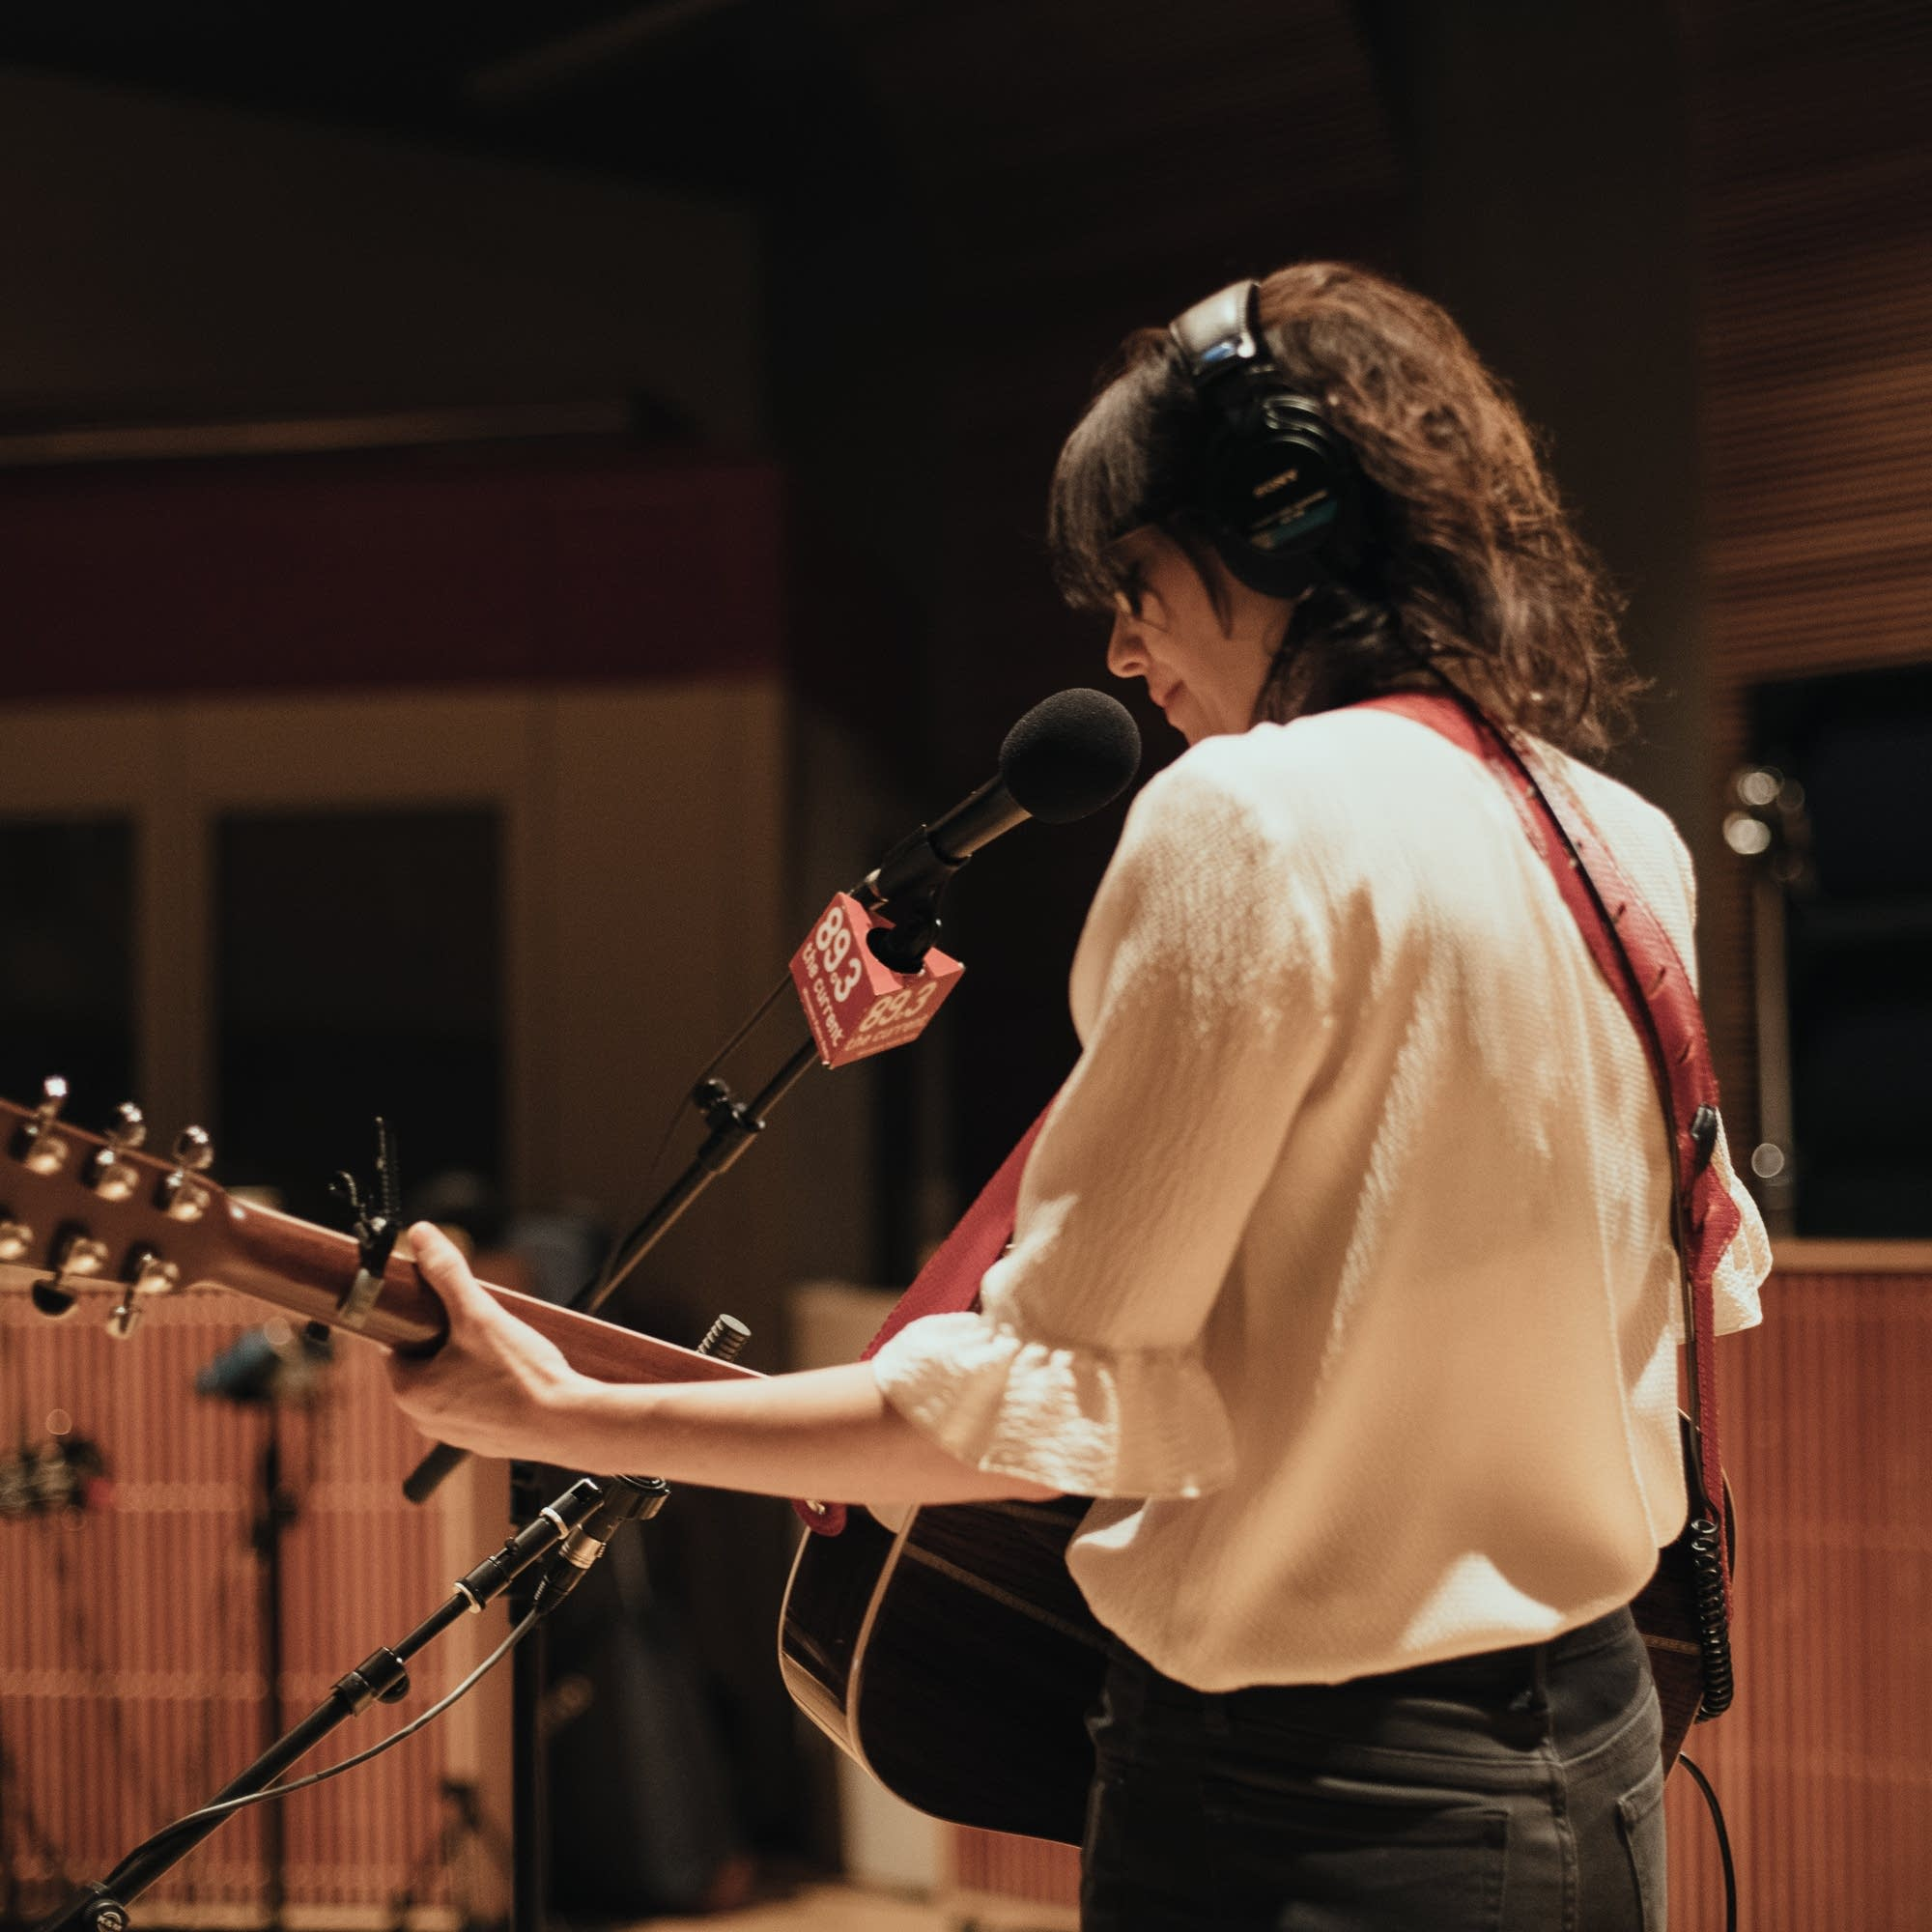 Pieta Brown performs in The Current studio